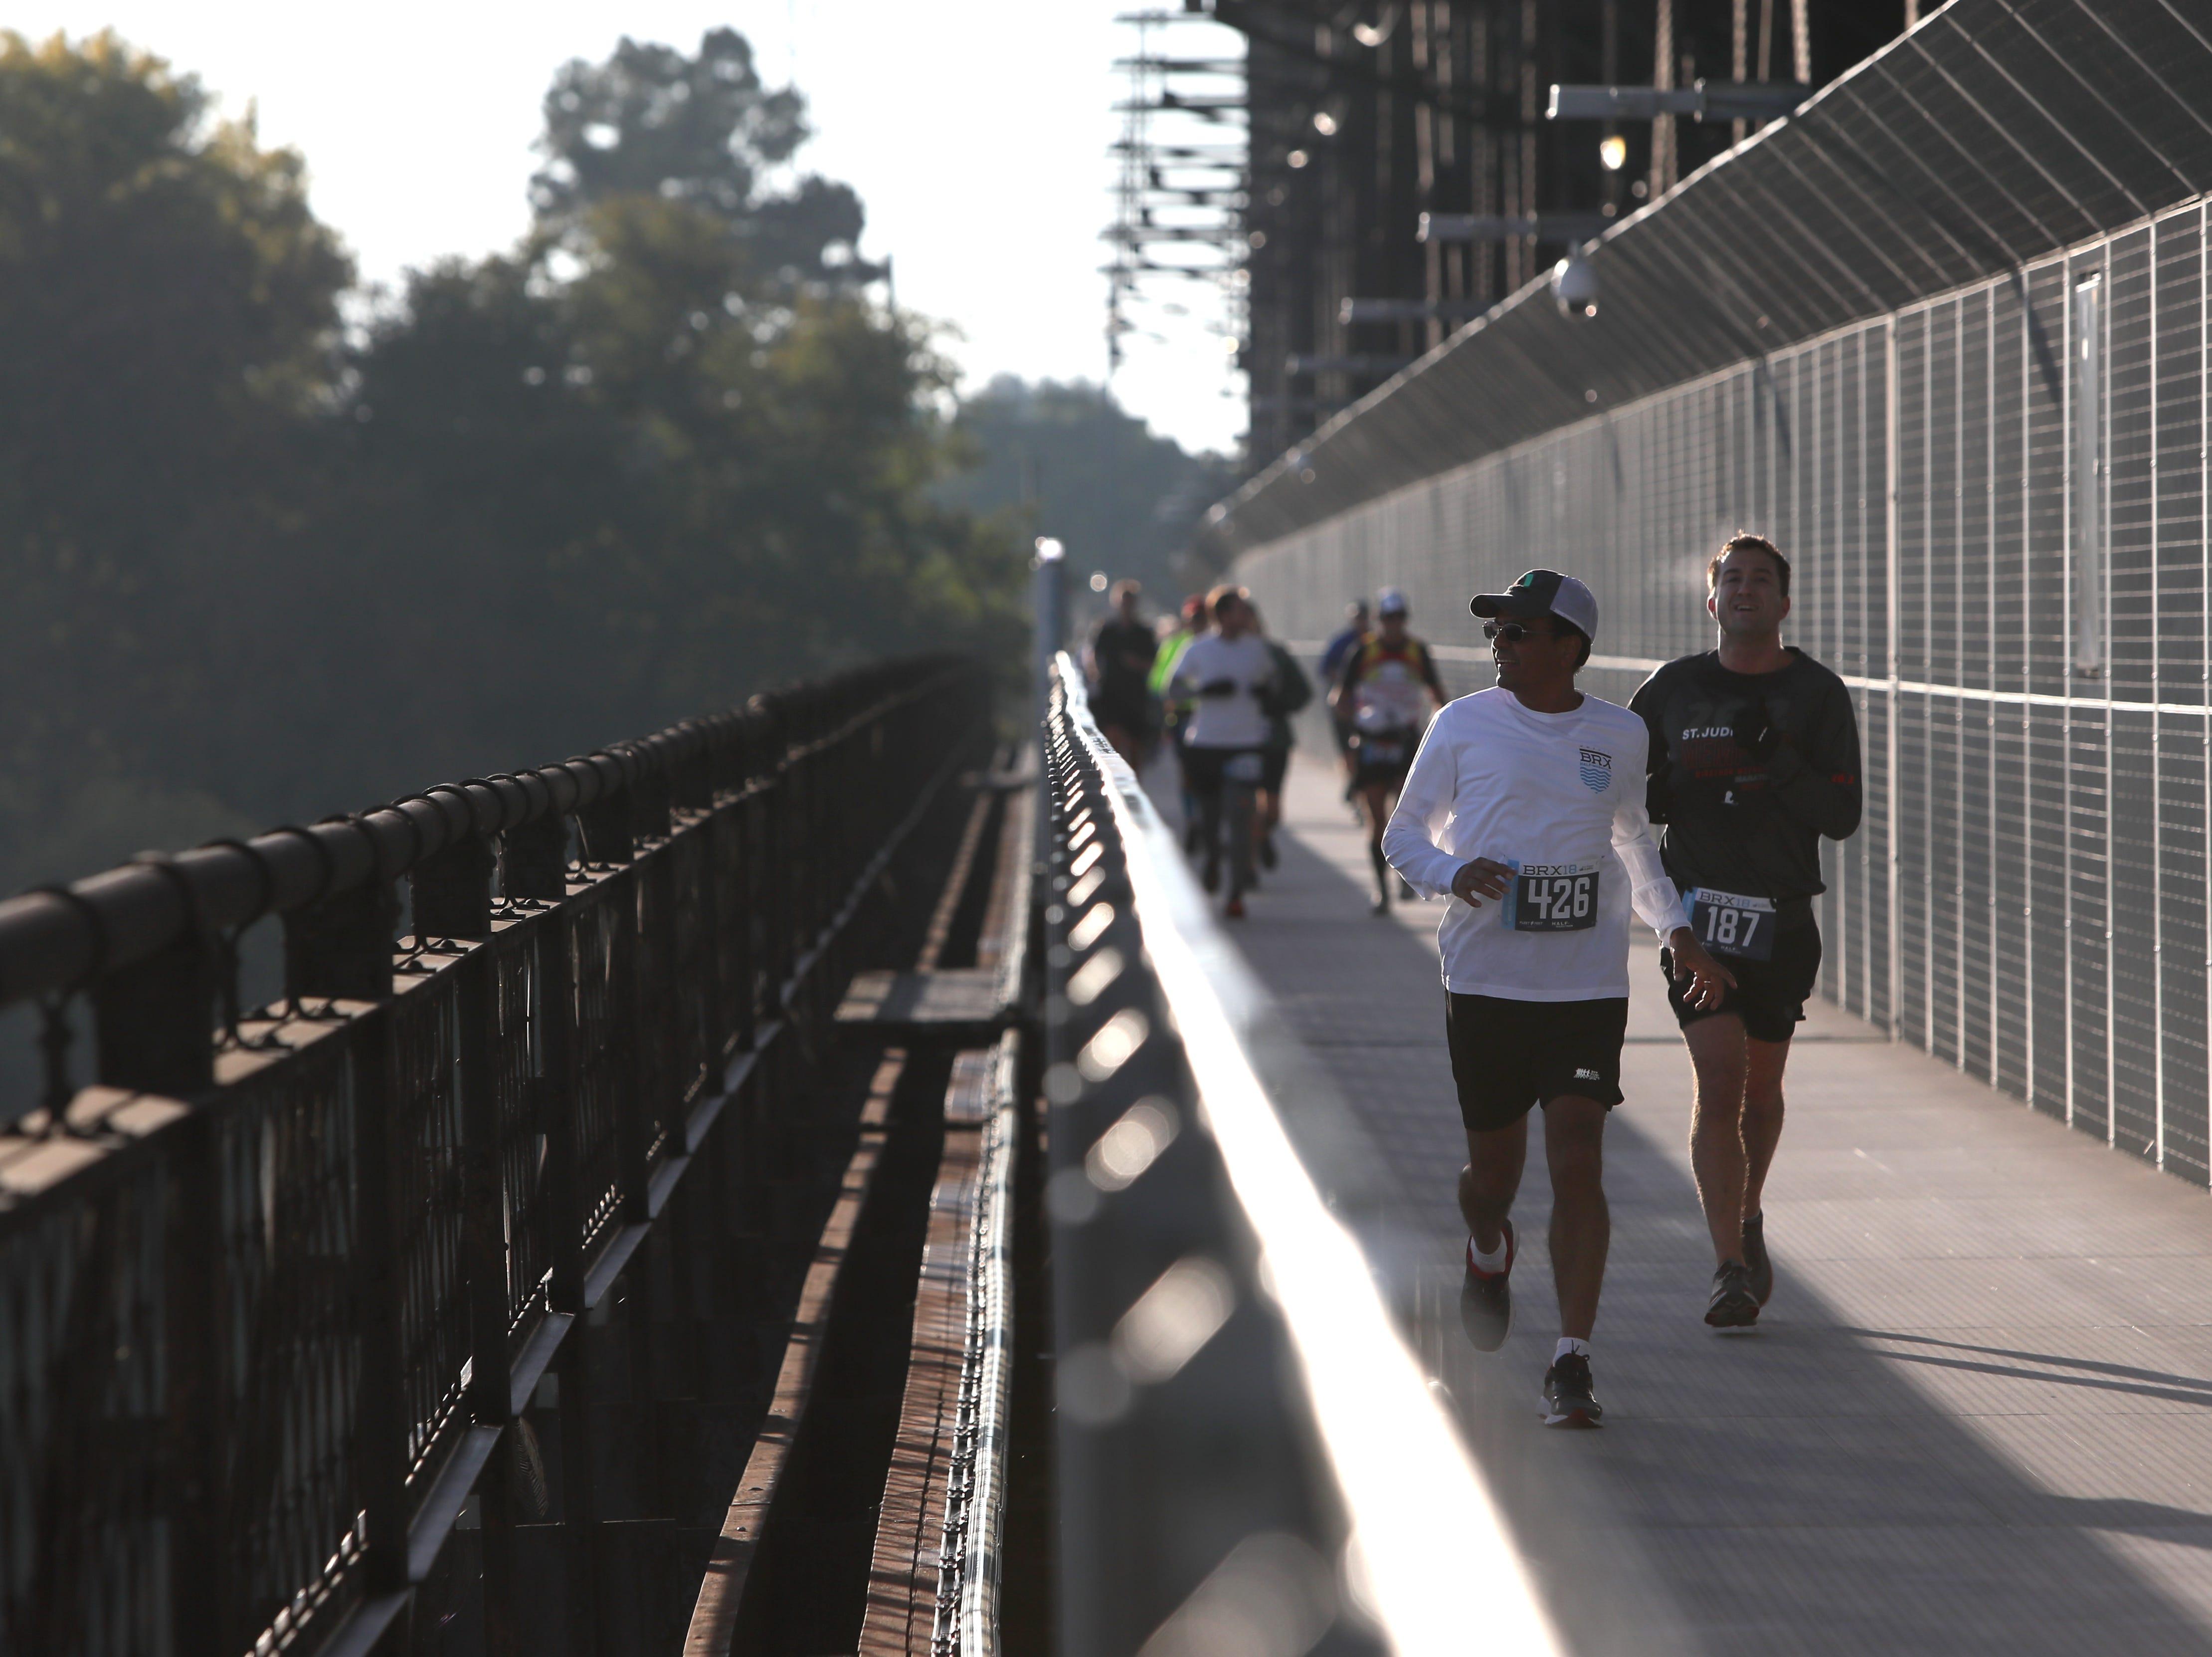 The Big River Crossing Half-Marathon and 5K run downtown Memphis Saturday, November 3, 2018.